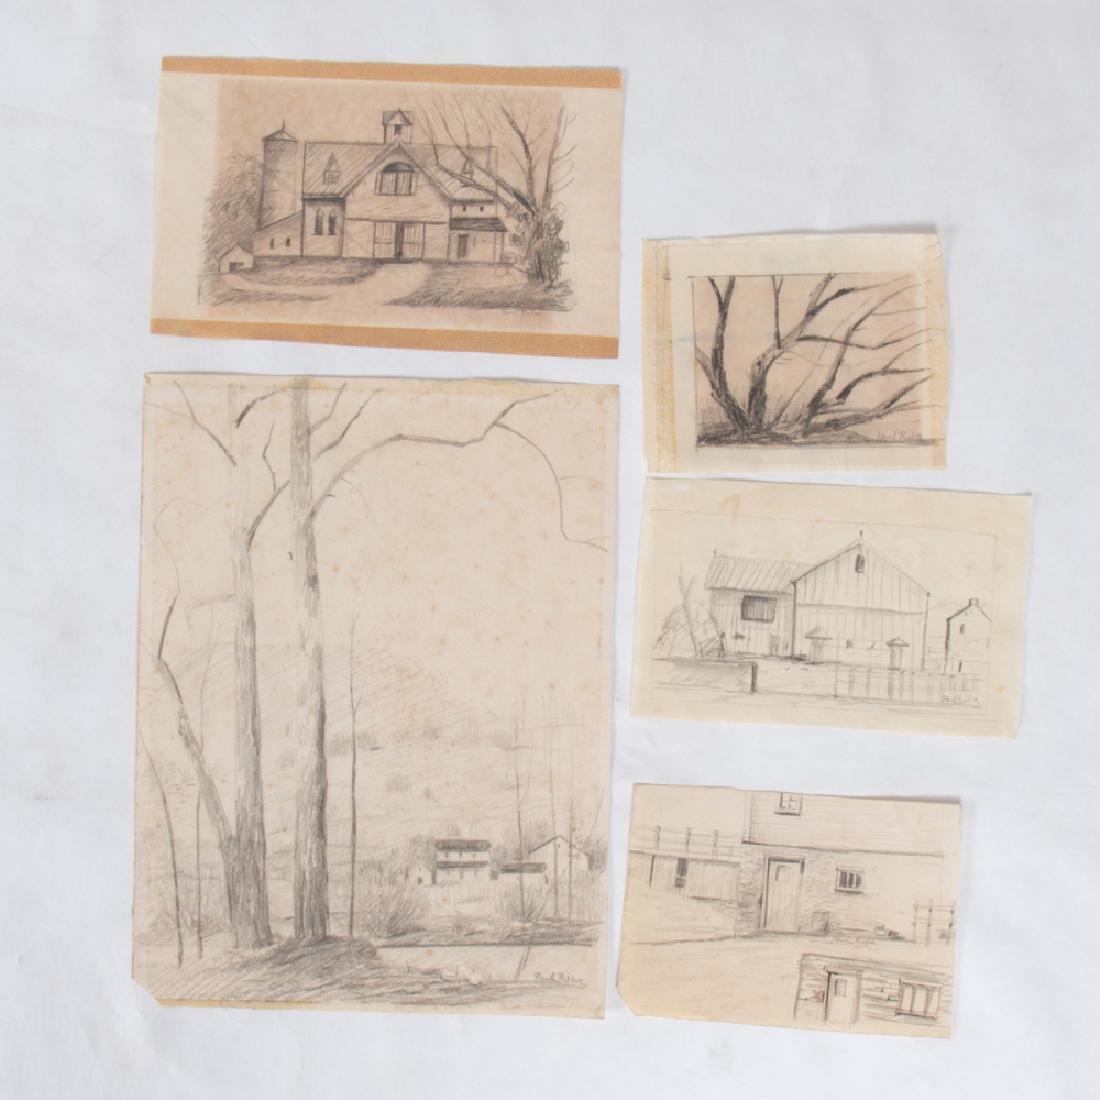 Paul Riba (1912-1977) A Group of Five Studies, Pencil